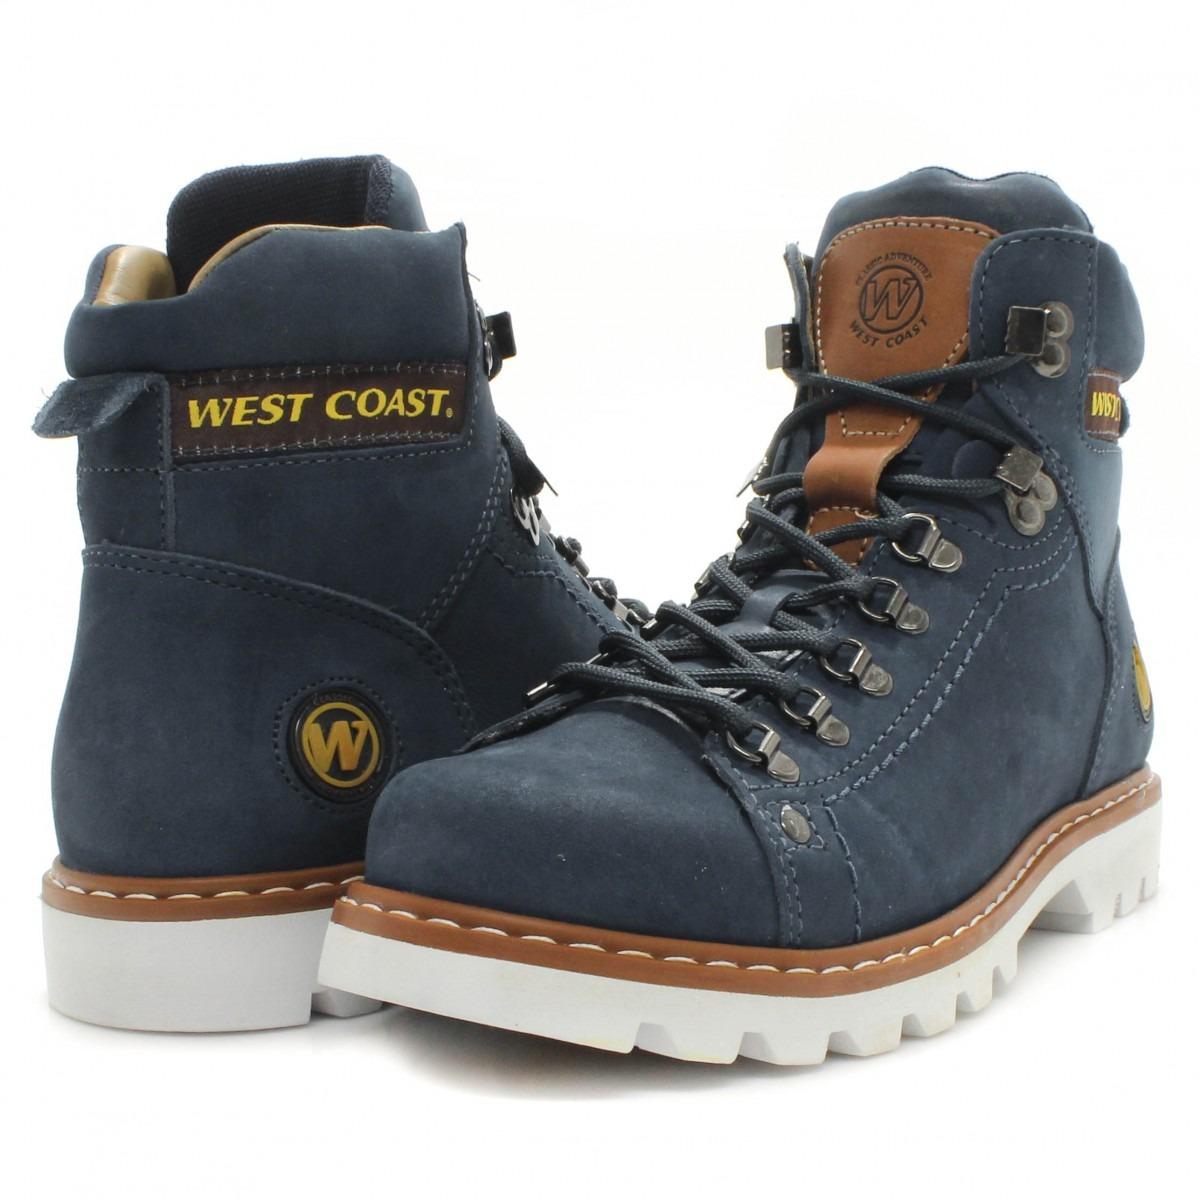 37a789ca82 Bota Coturno West Coast Worker Sneaker 122101